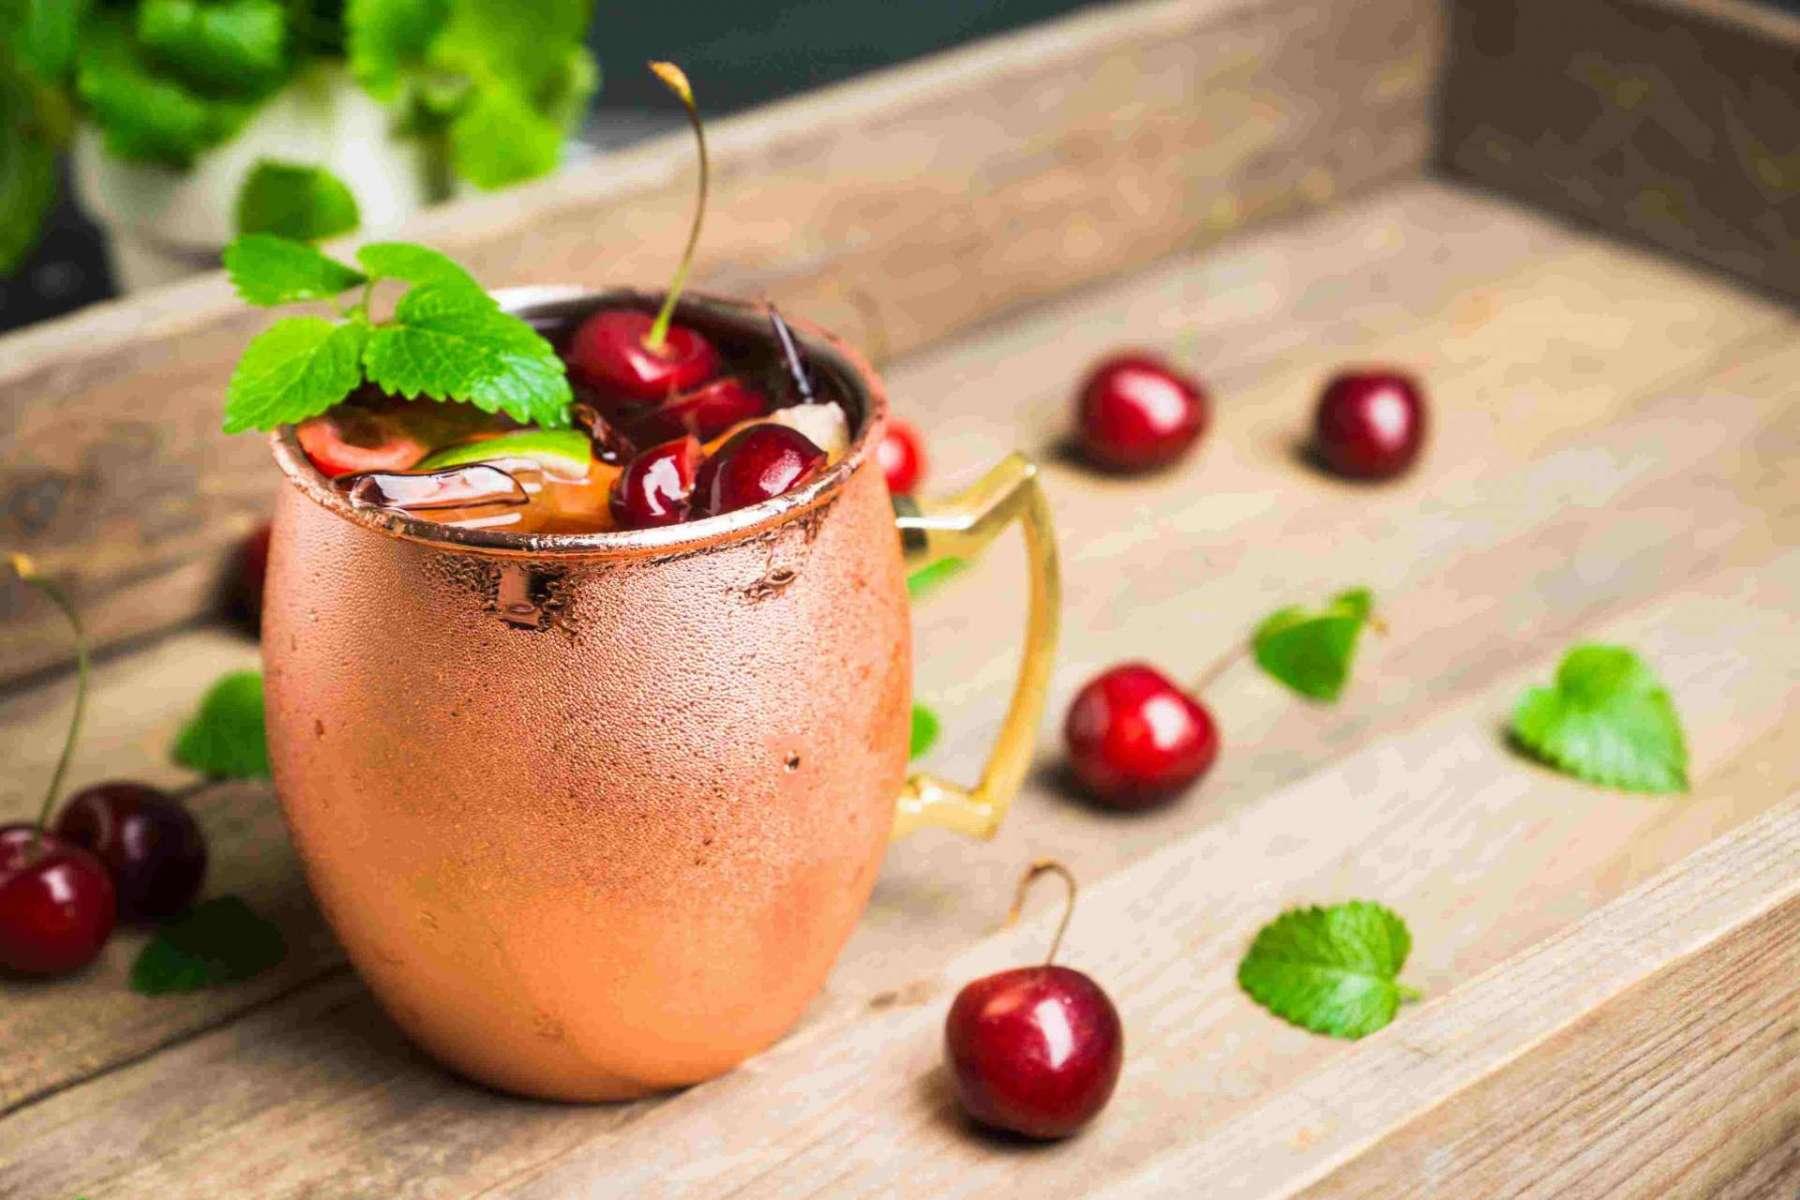 Cherry Mule Drink